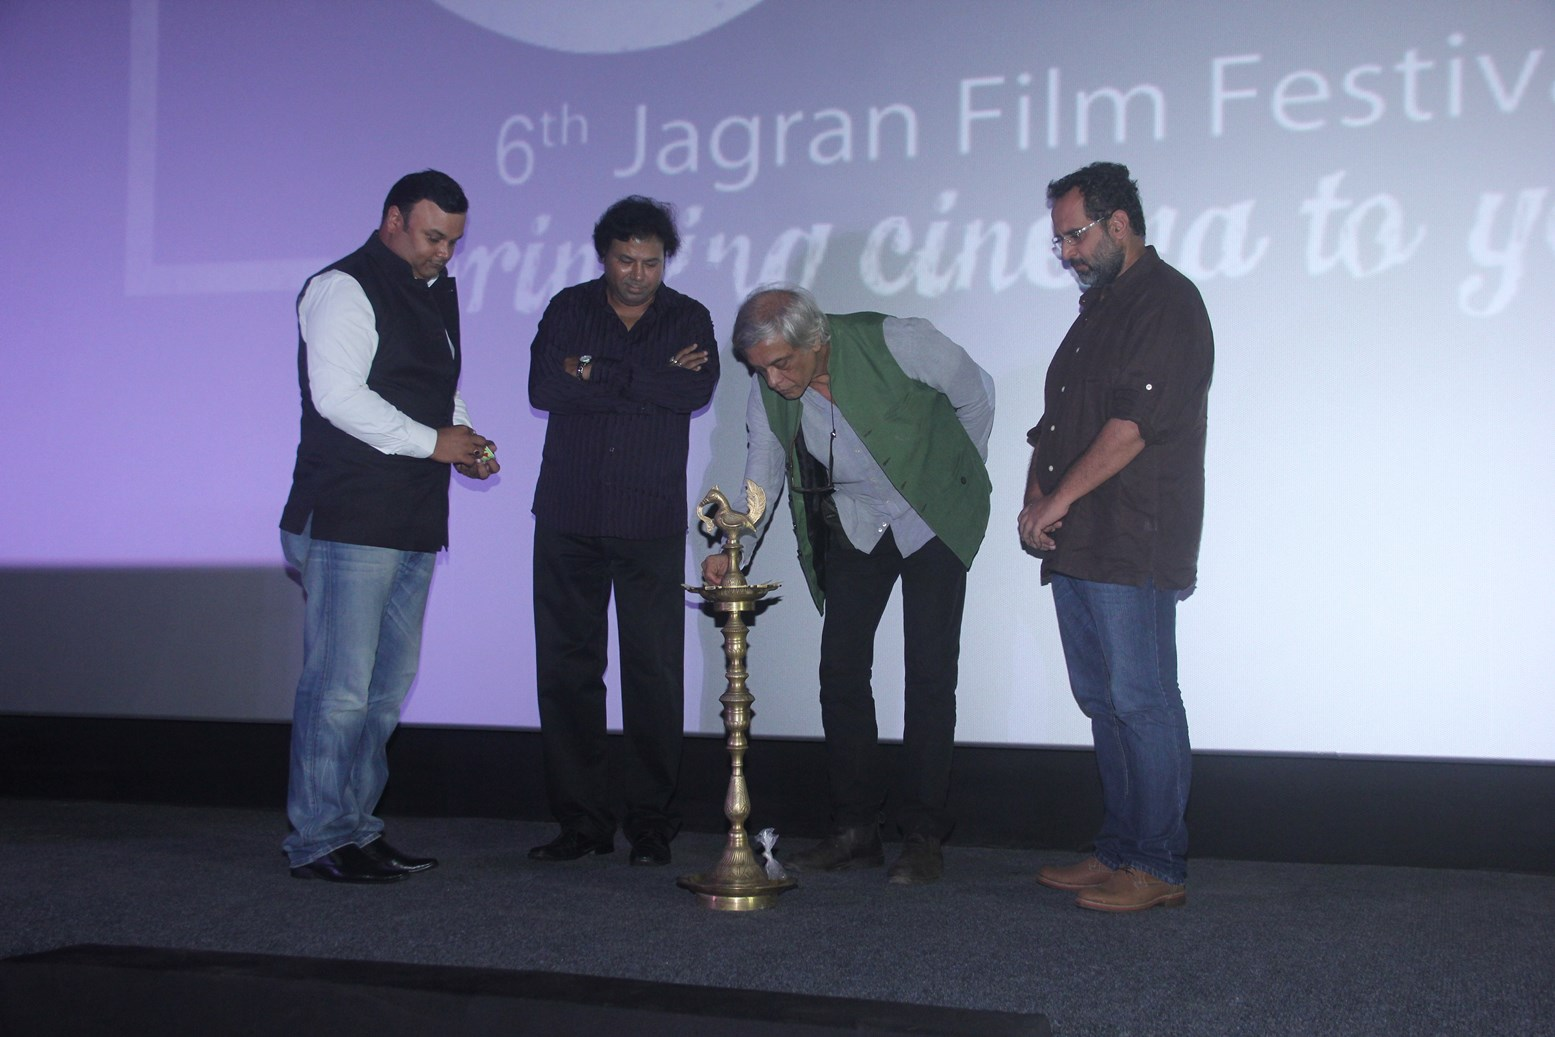 Mr. Vinod Srivastava, Mr. Manoj Srivastava, Sudhir Mishra and Anil Sharma at the Opening Ceremony of the 6th Jagran Film Festival 2015.